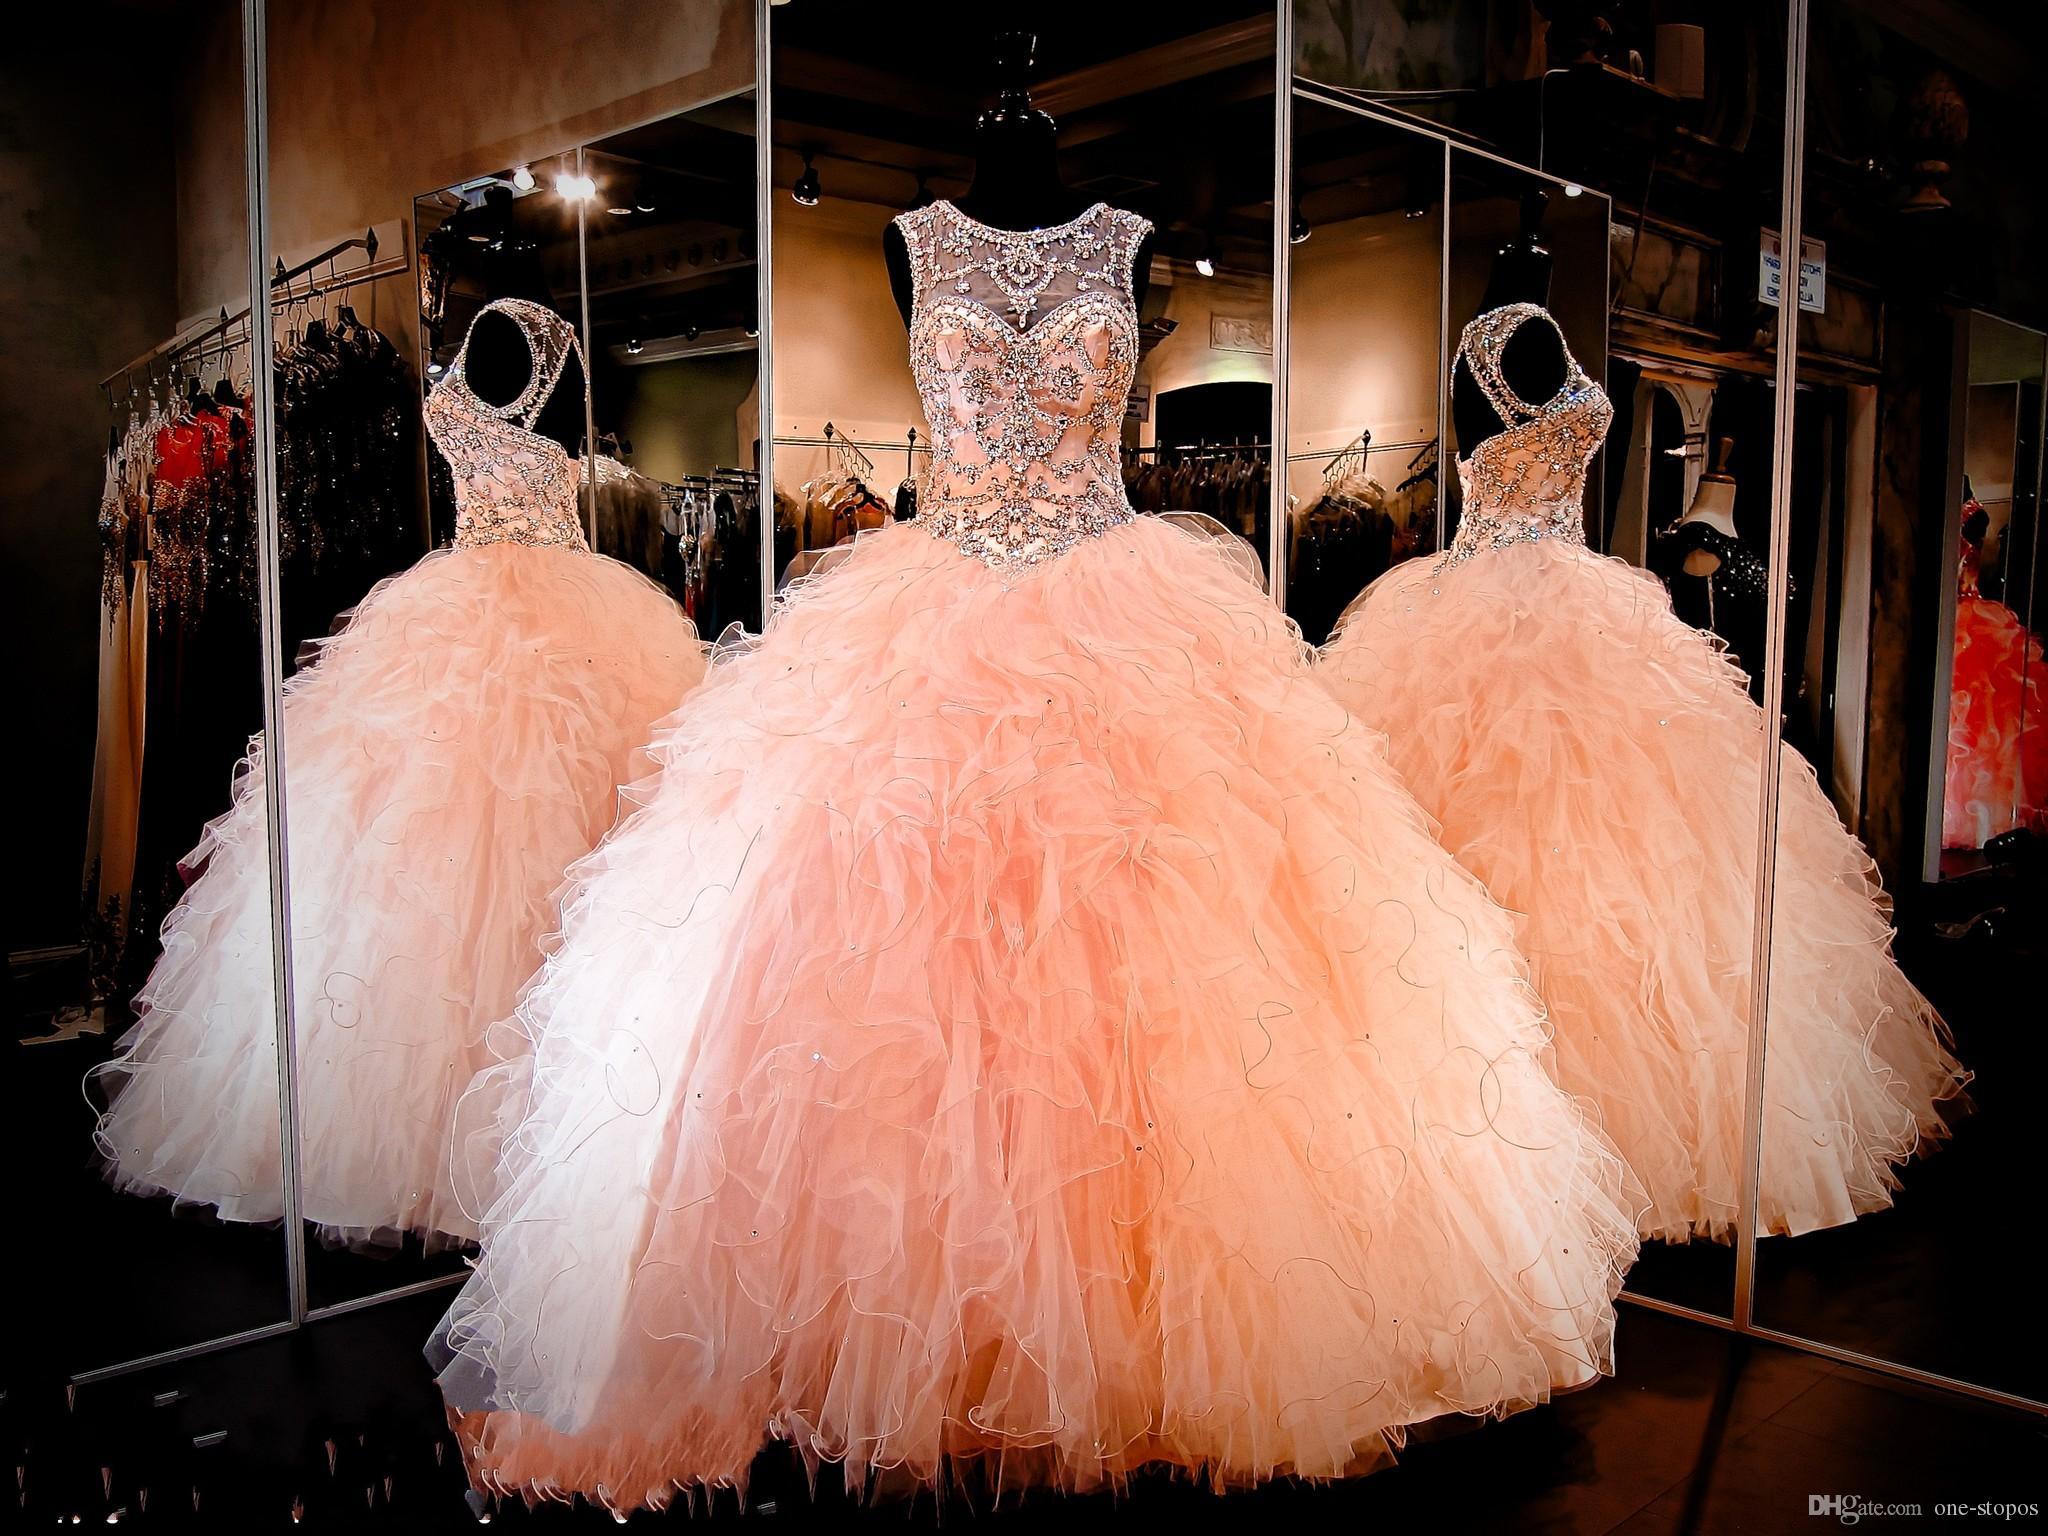 2017 Rhinestone Kryształy Blush Pink Quinceanera Sukienki Sheer Jewel Sweet 16 Pageant Dress Ruffles Spódnica Princess Prom Suknie